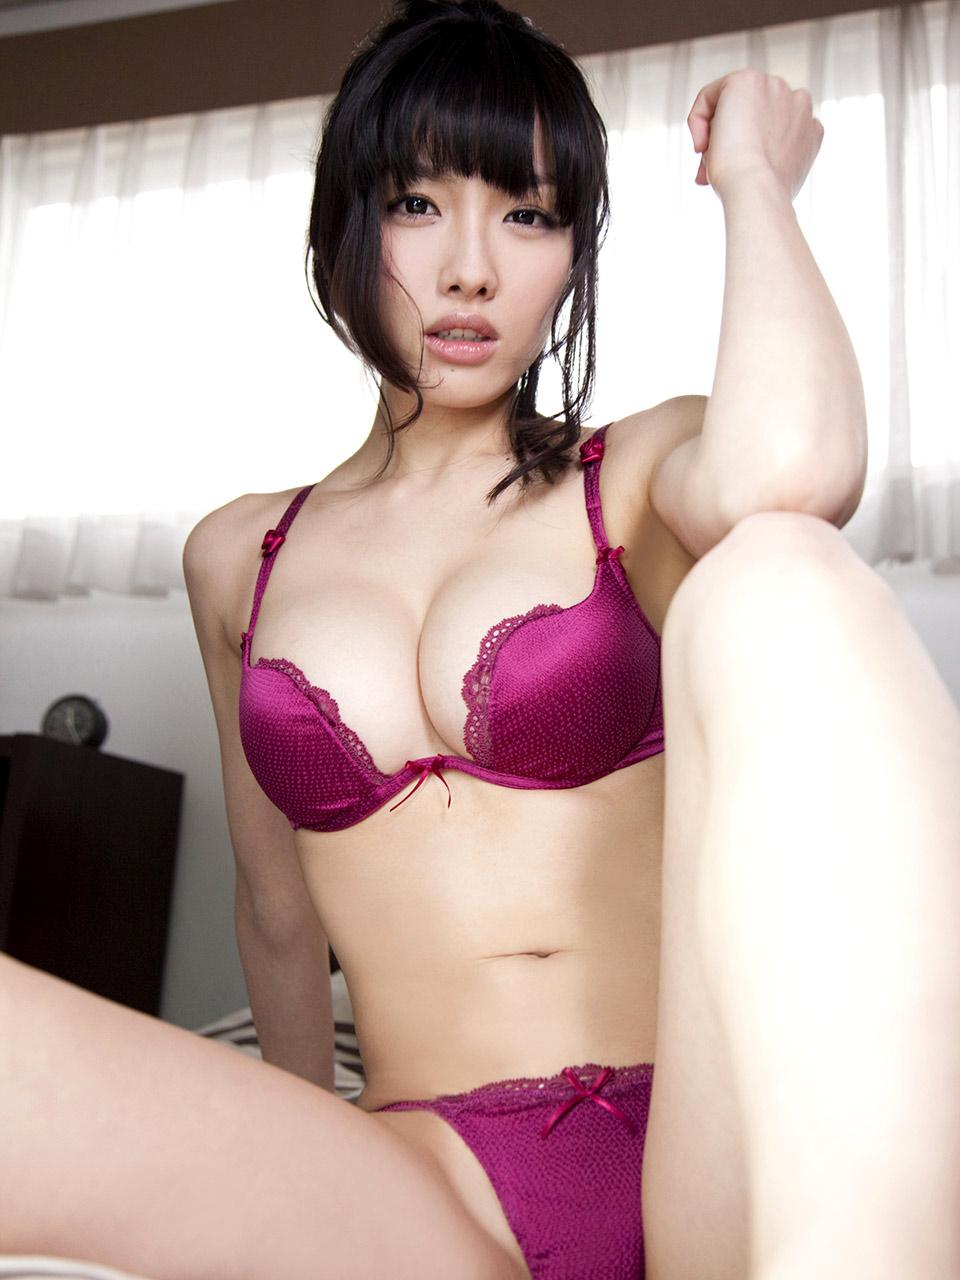 yaponki-v-seksualnom-bele